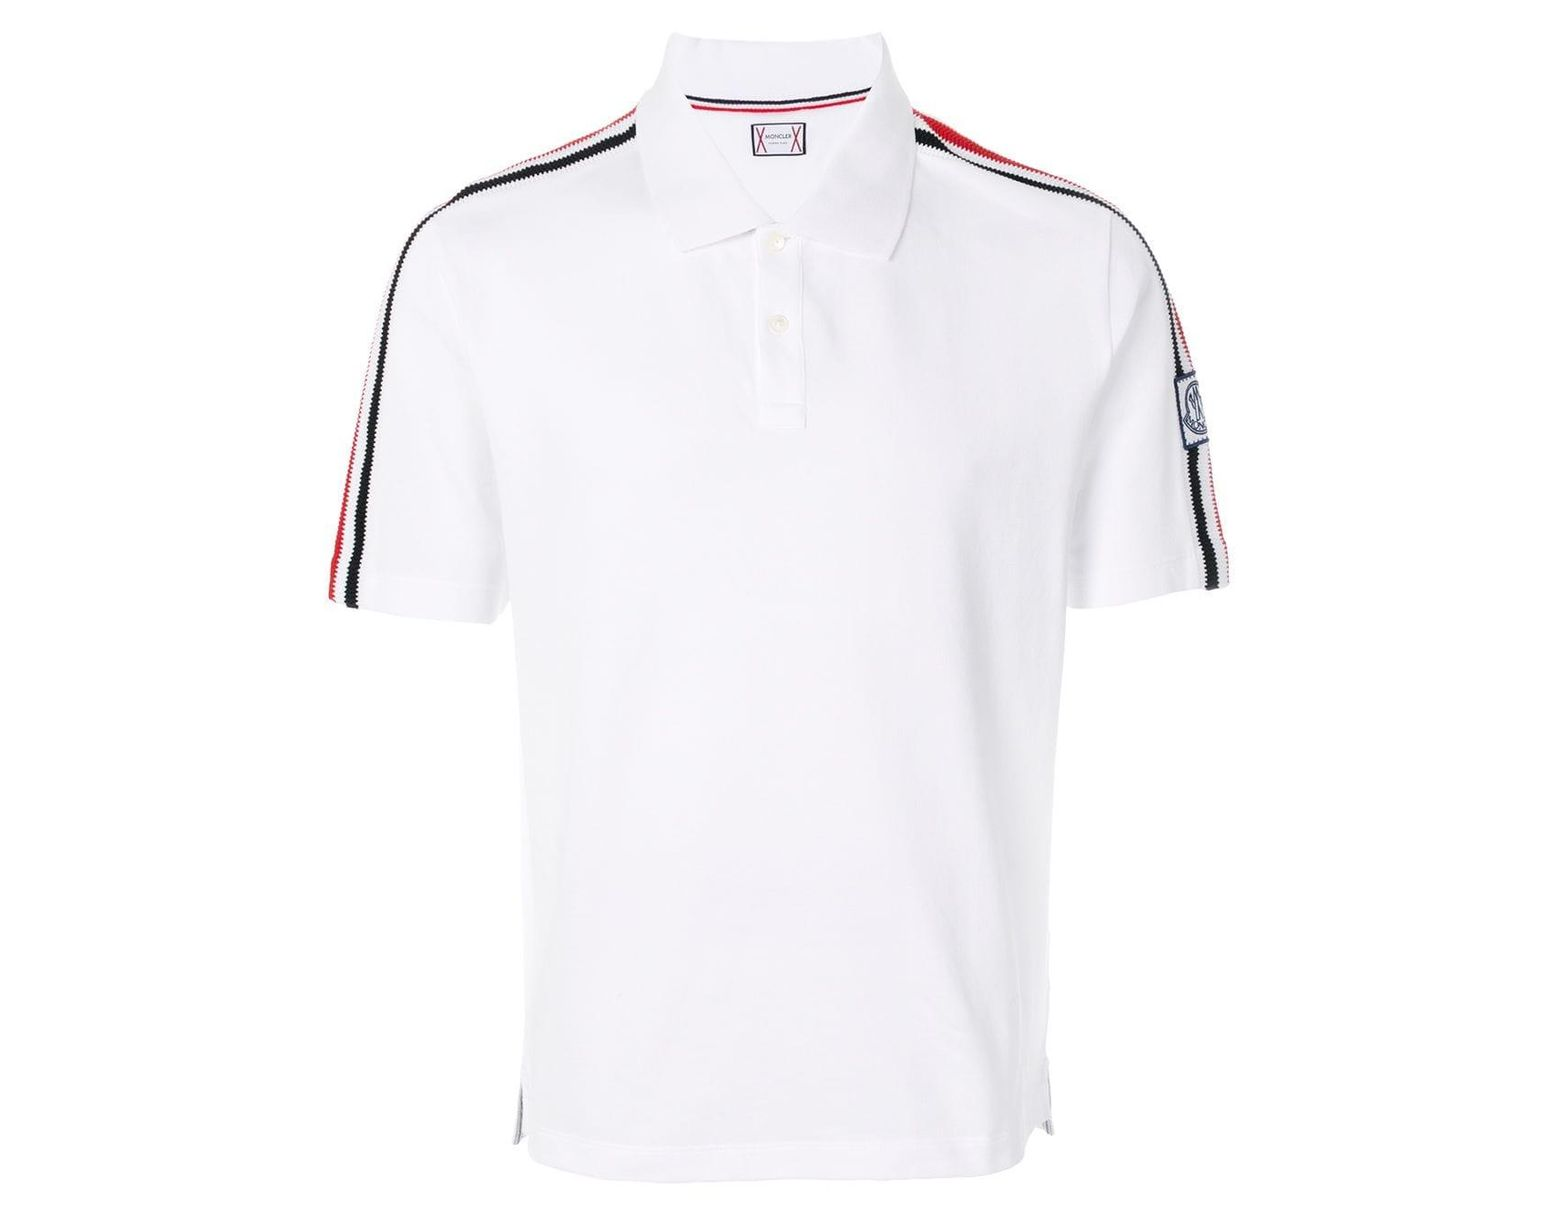 4ec7a1ce8 Men's White Shoulder Strap Polo Shirt